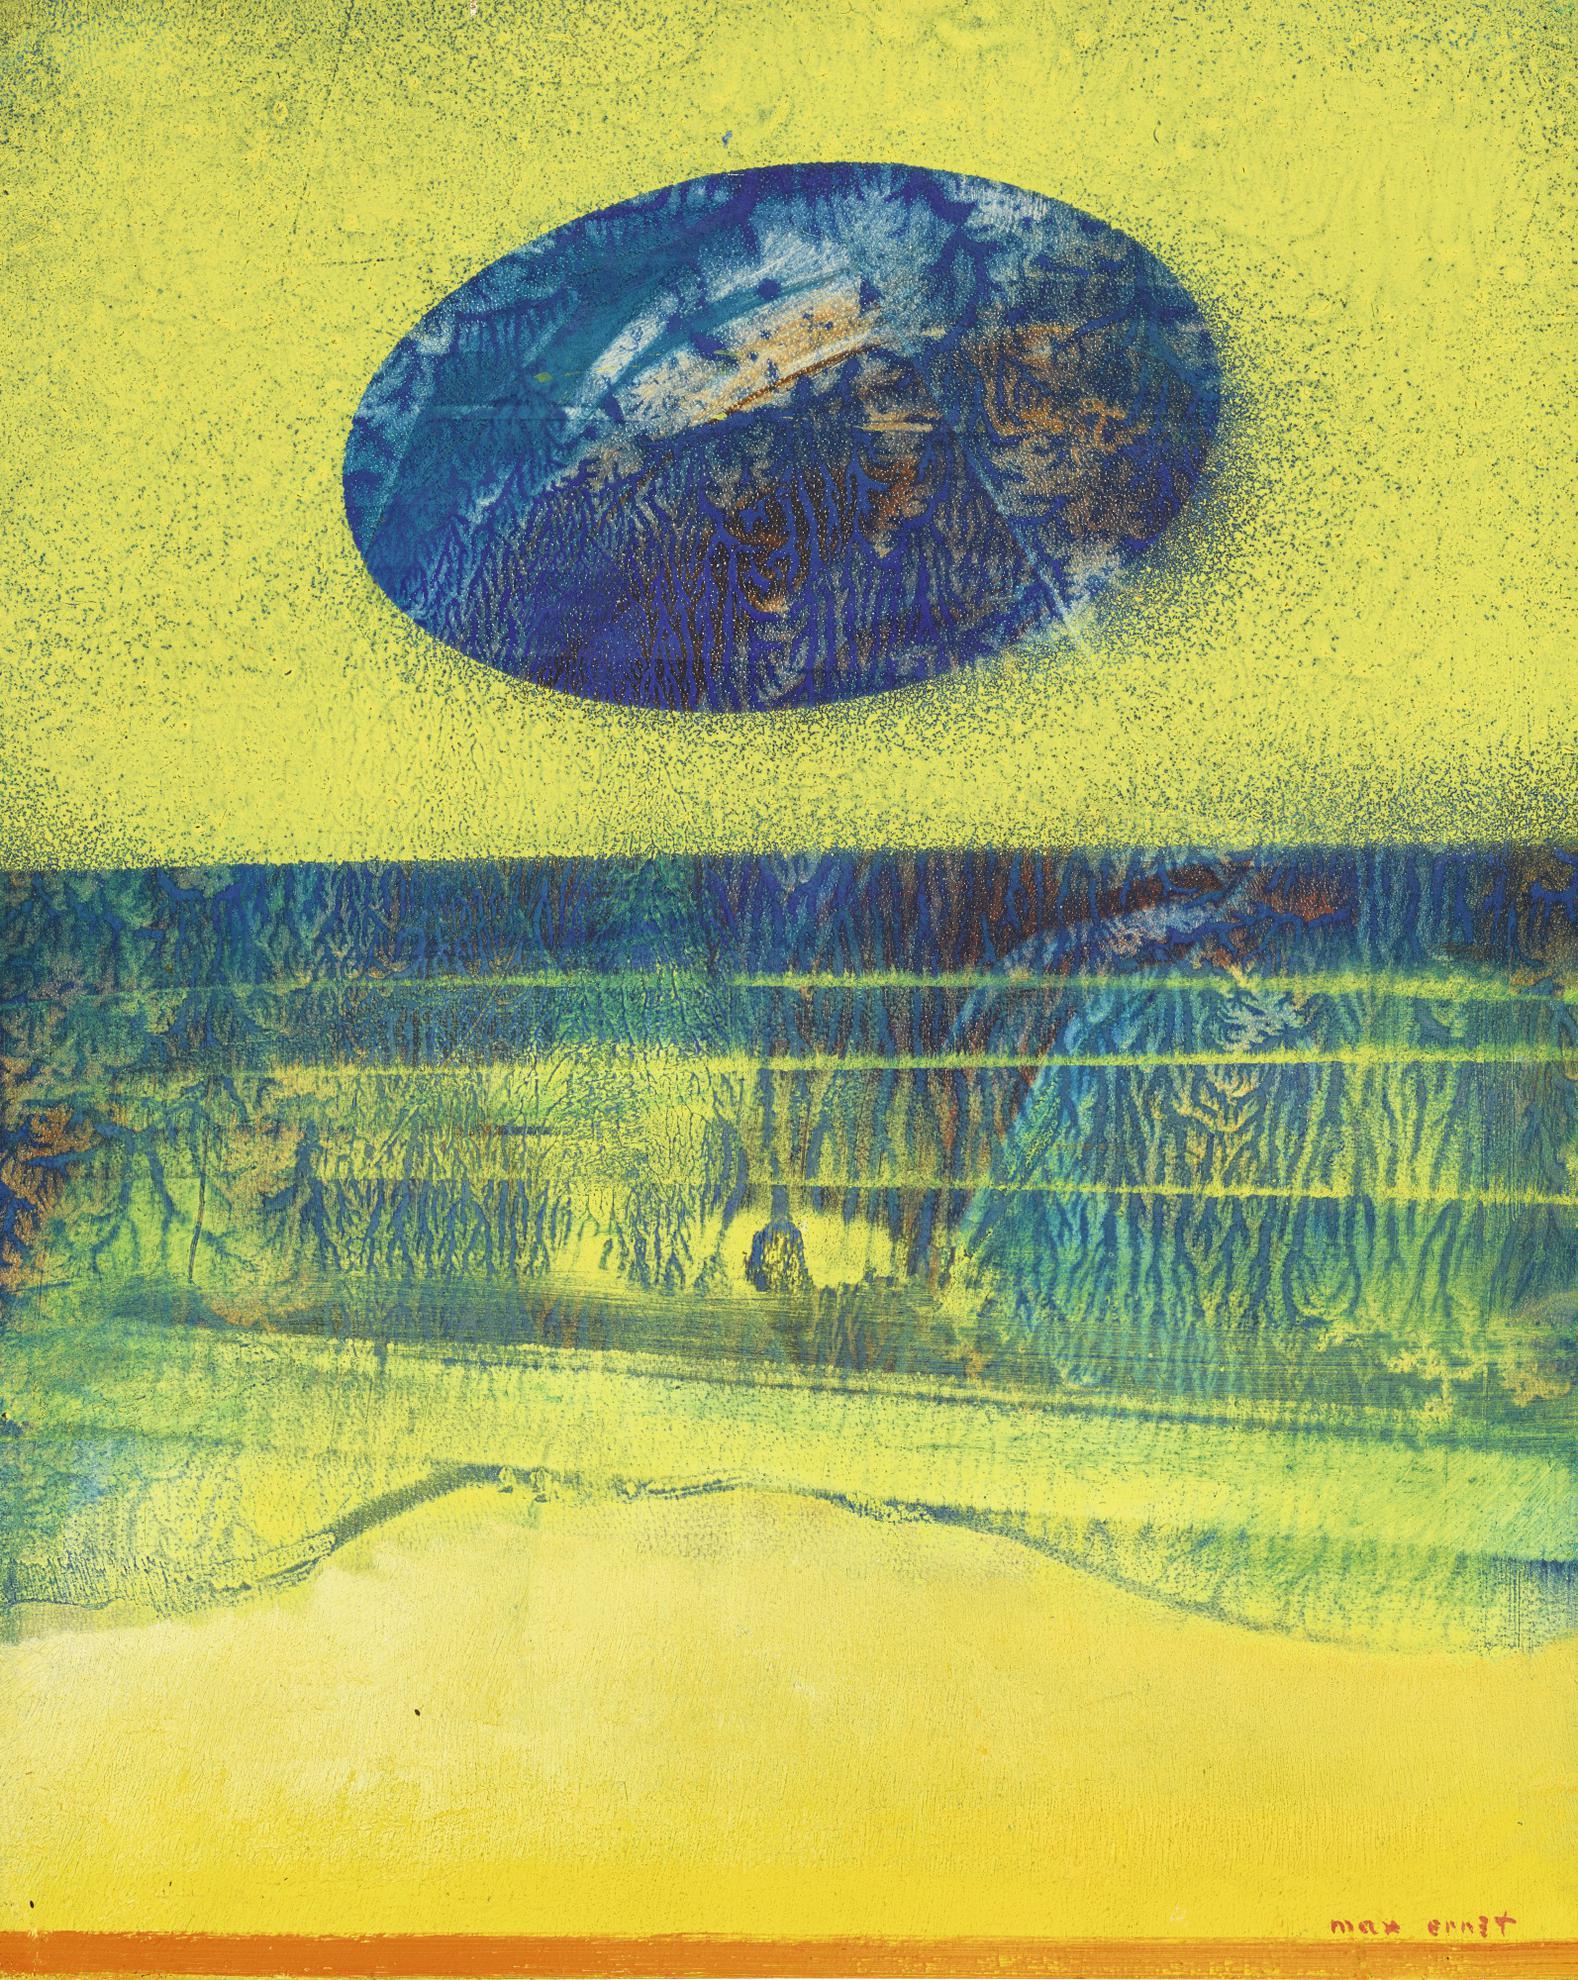 Max Ernst-Soudain I-1962